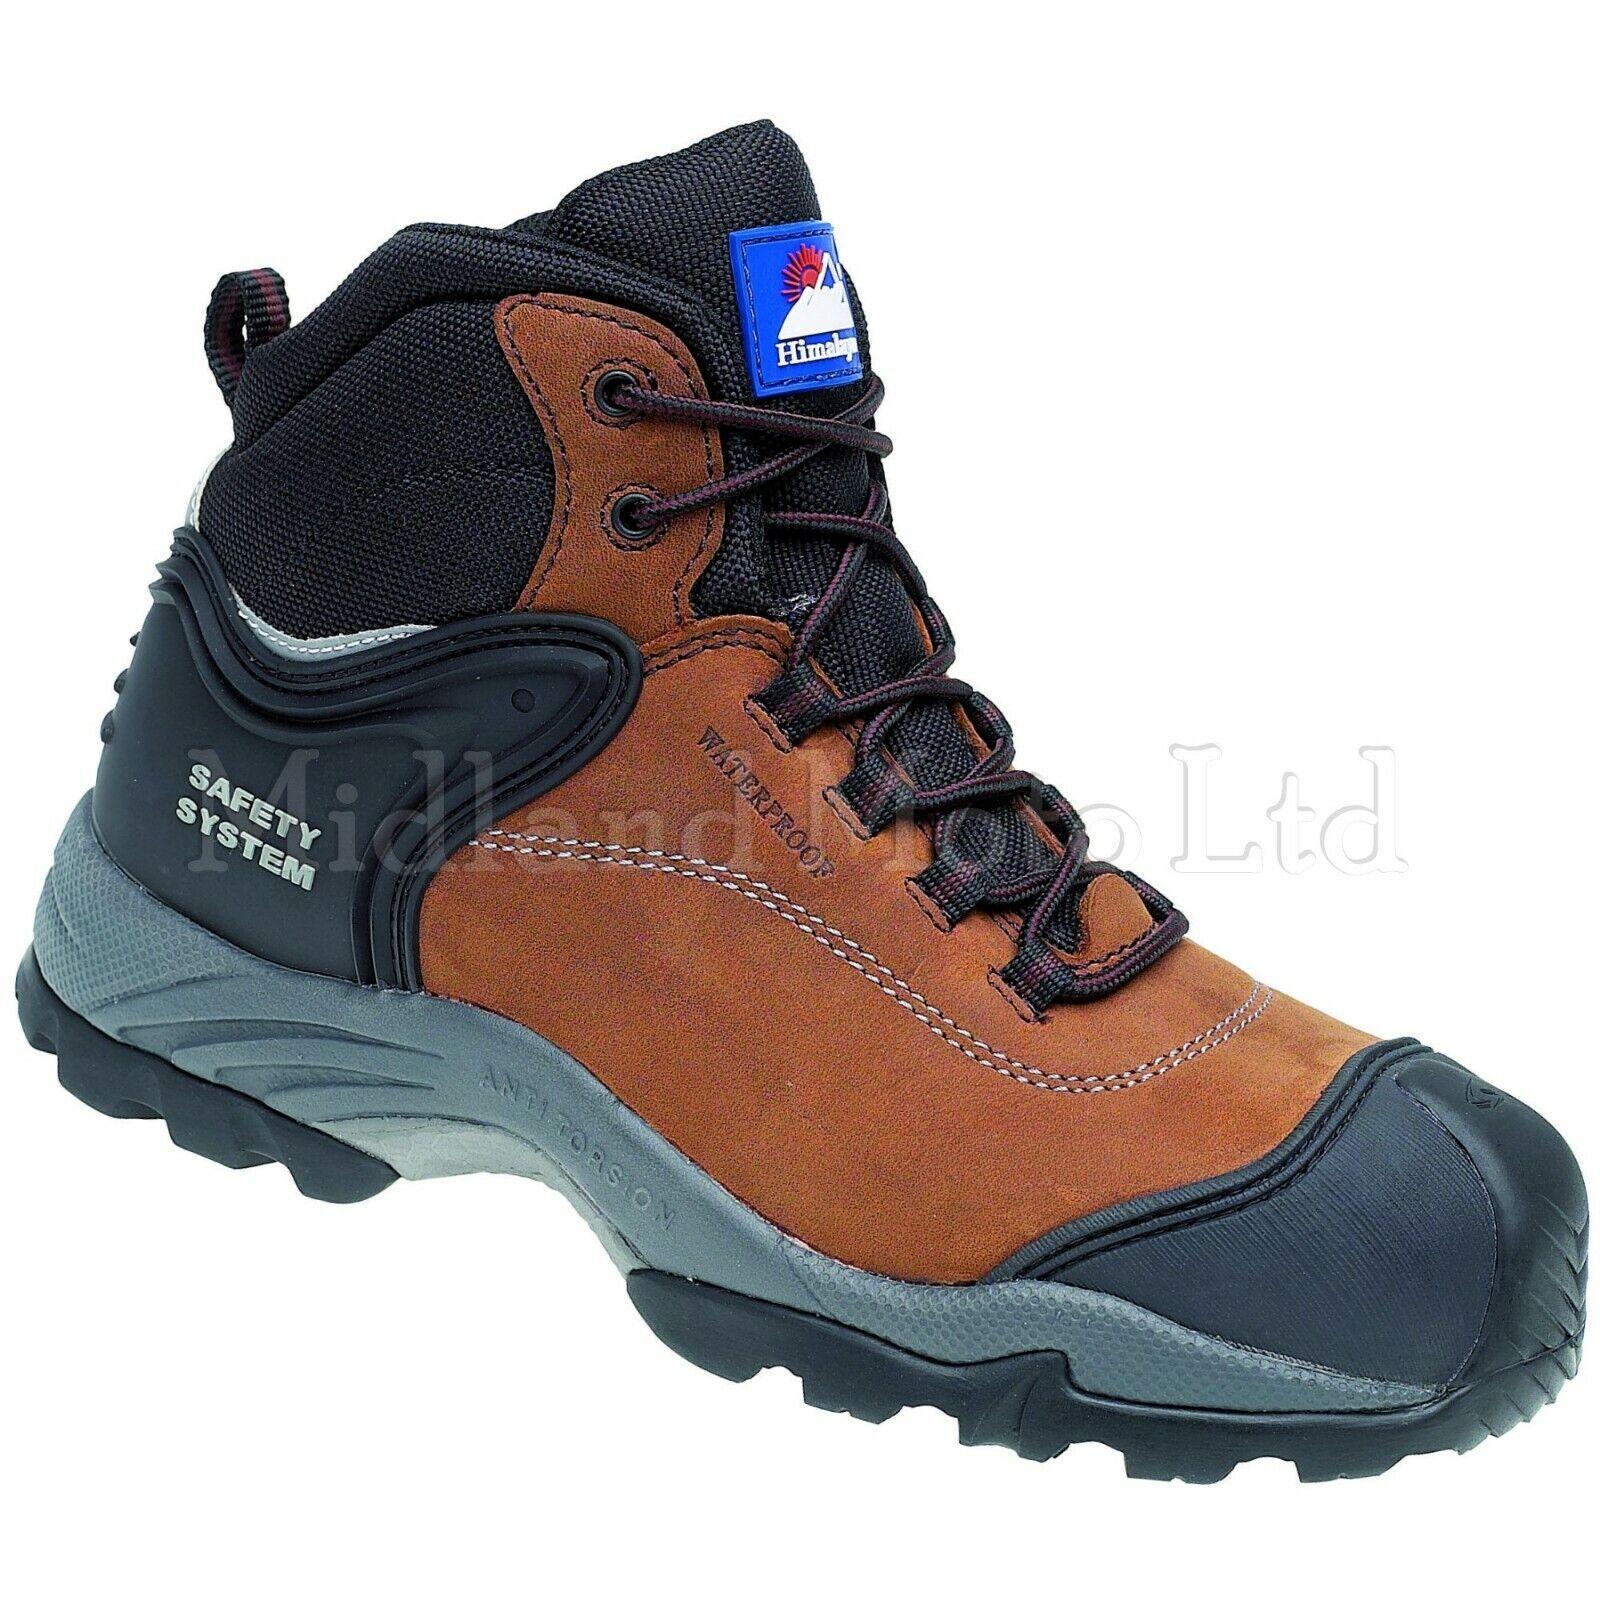 Magnum Hamburg 6.0 Waterproof Safety Composite Leather Mens Work Boots UK6-13